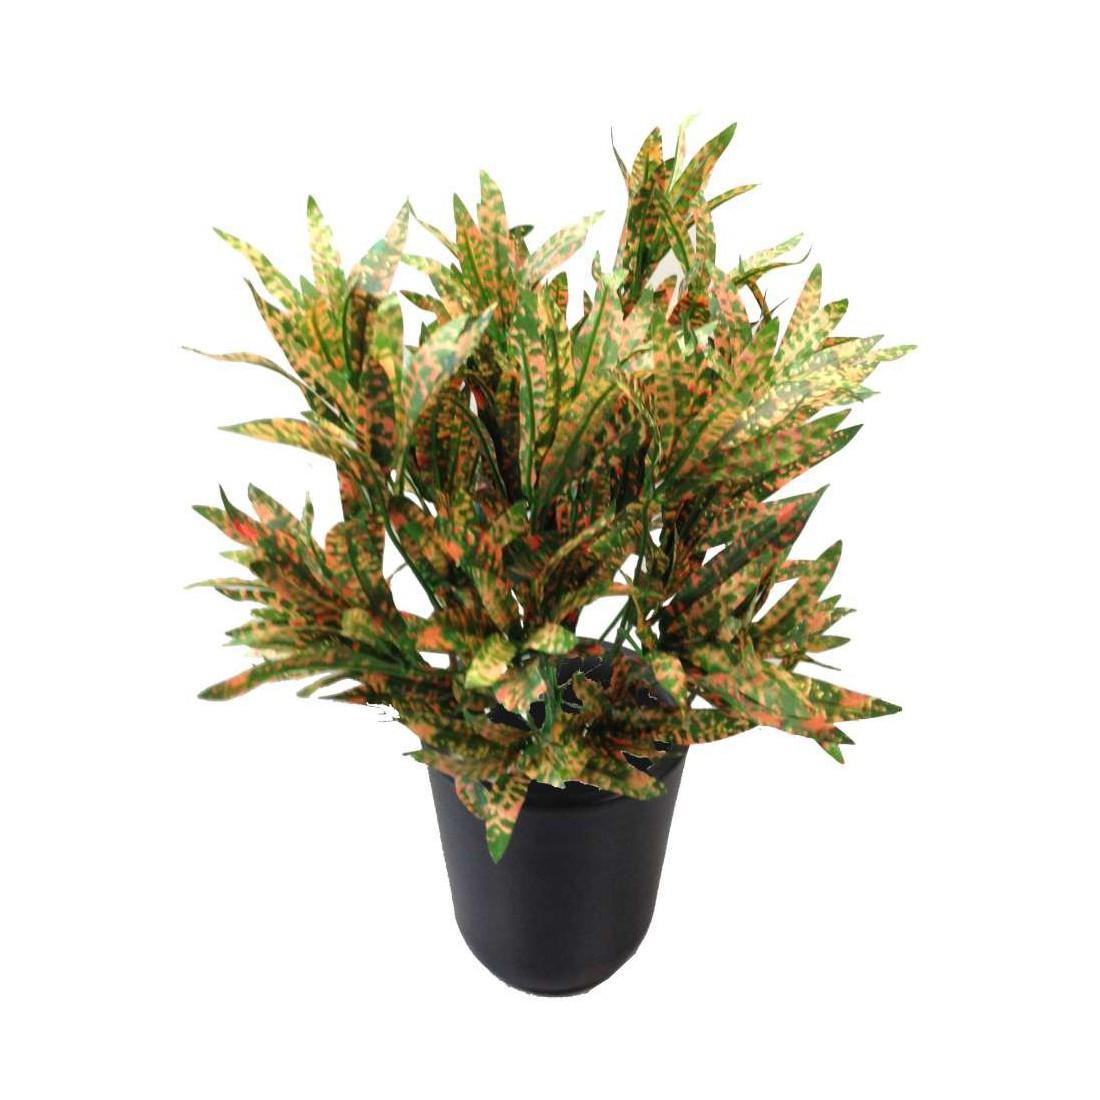 Croton spider 40cm plantes artificielles plantes vertes for Plantes artificielles lyon